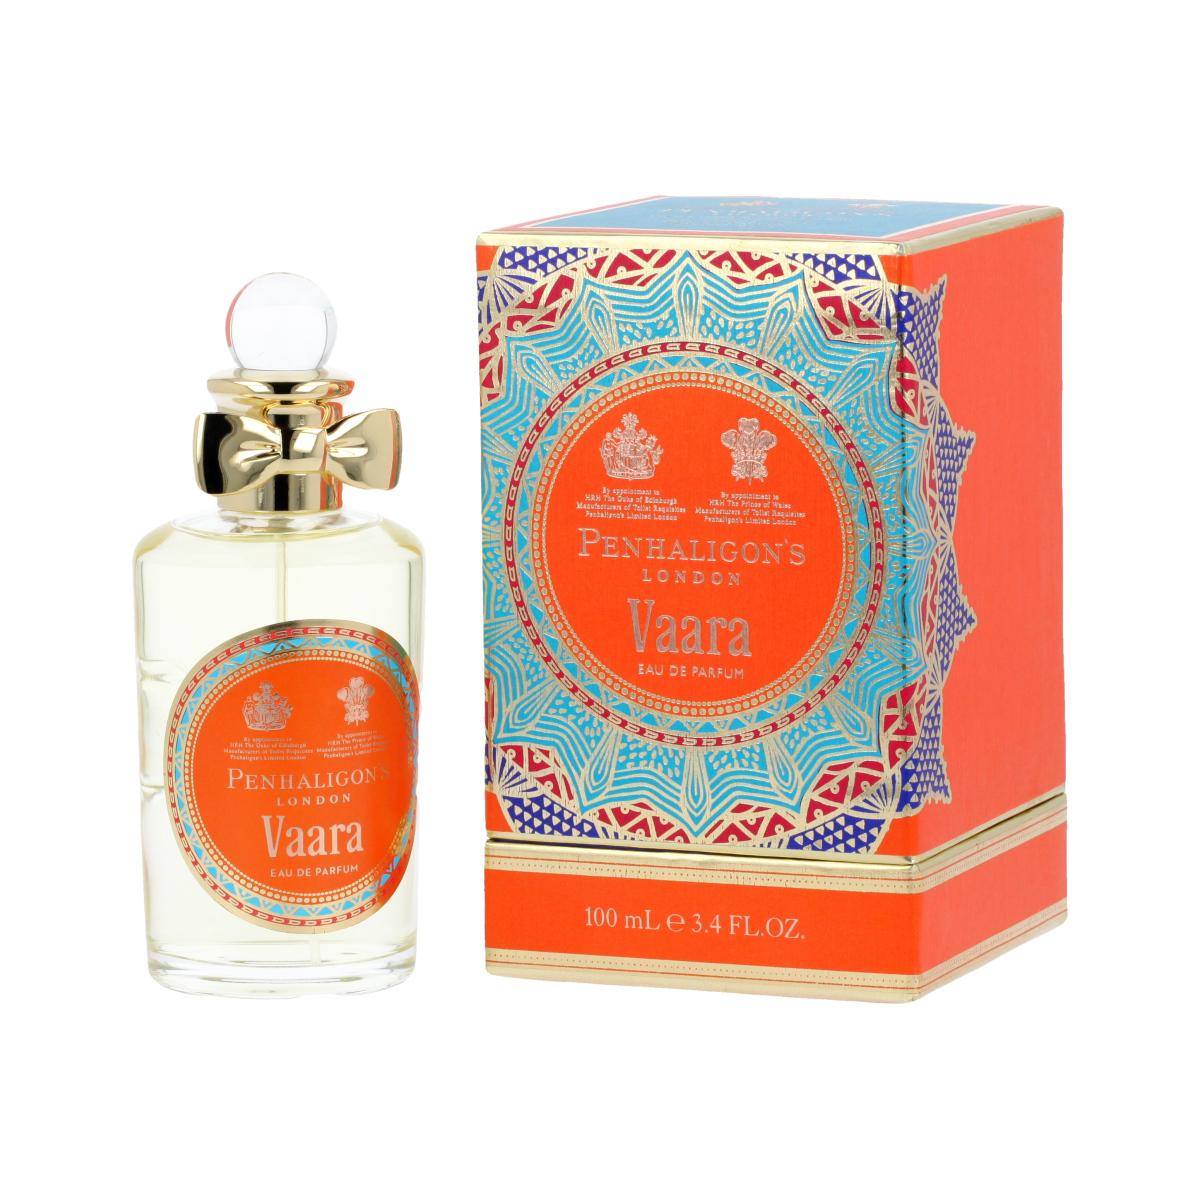 Penhaligon's Vaara Eau De Parfum 100 ml (unisex) 86497